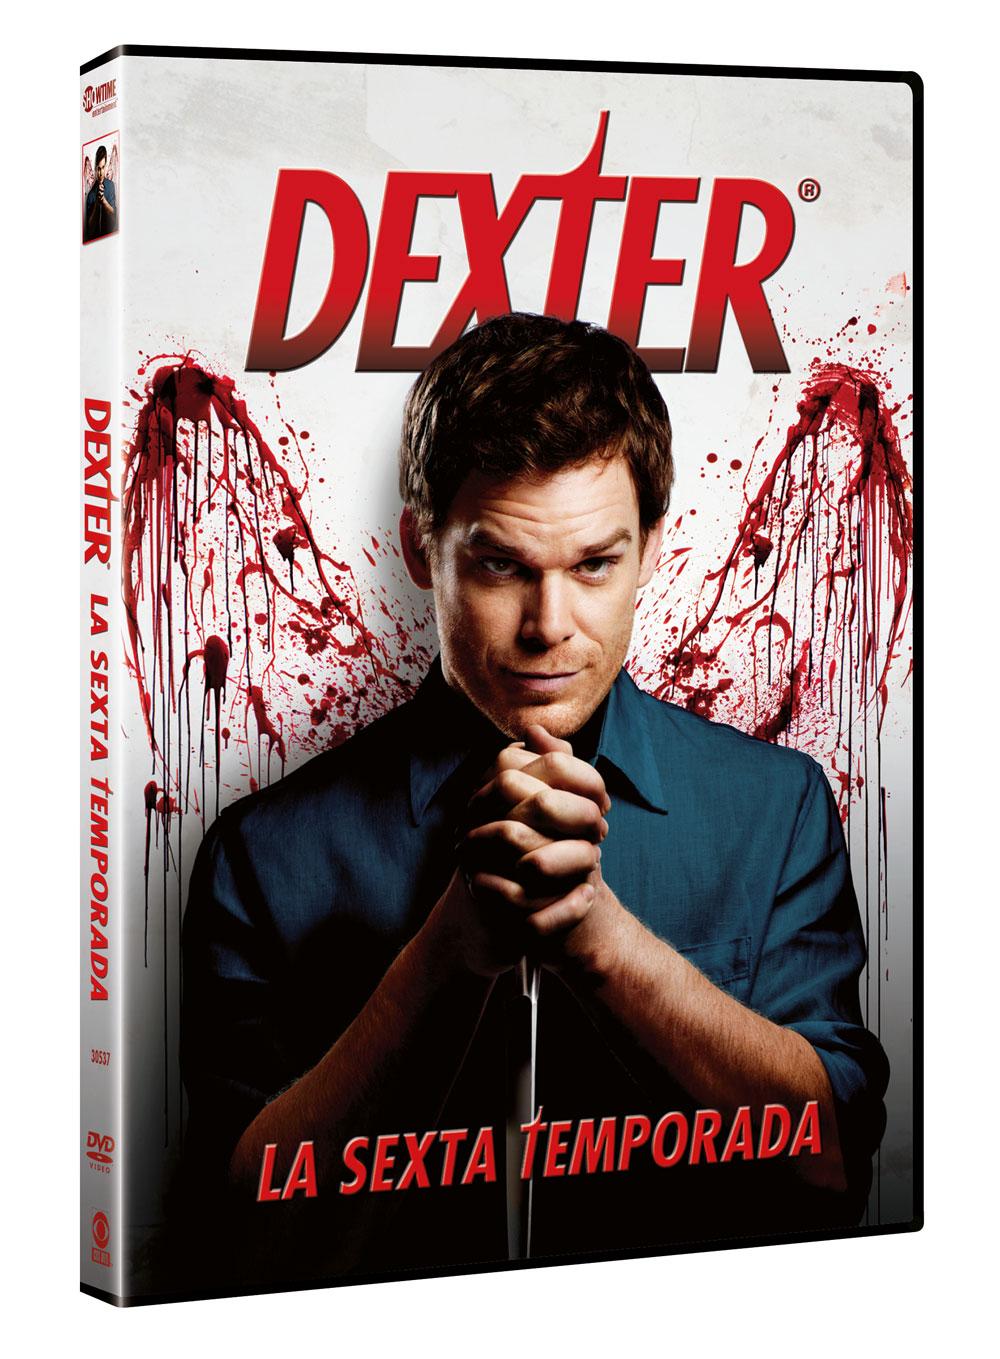 Dexter (2006) Tumbaabierta_Dexter-6-Temp_3D